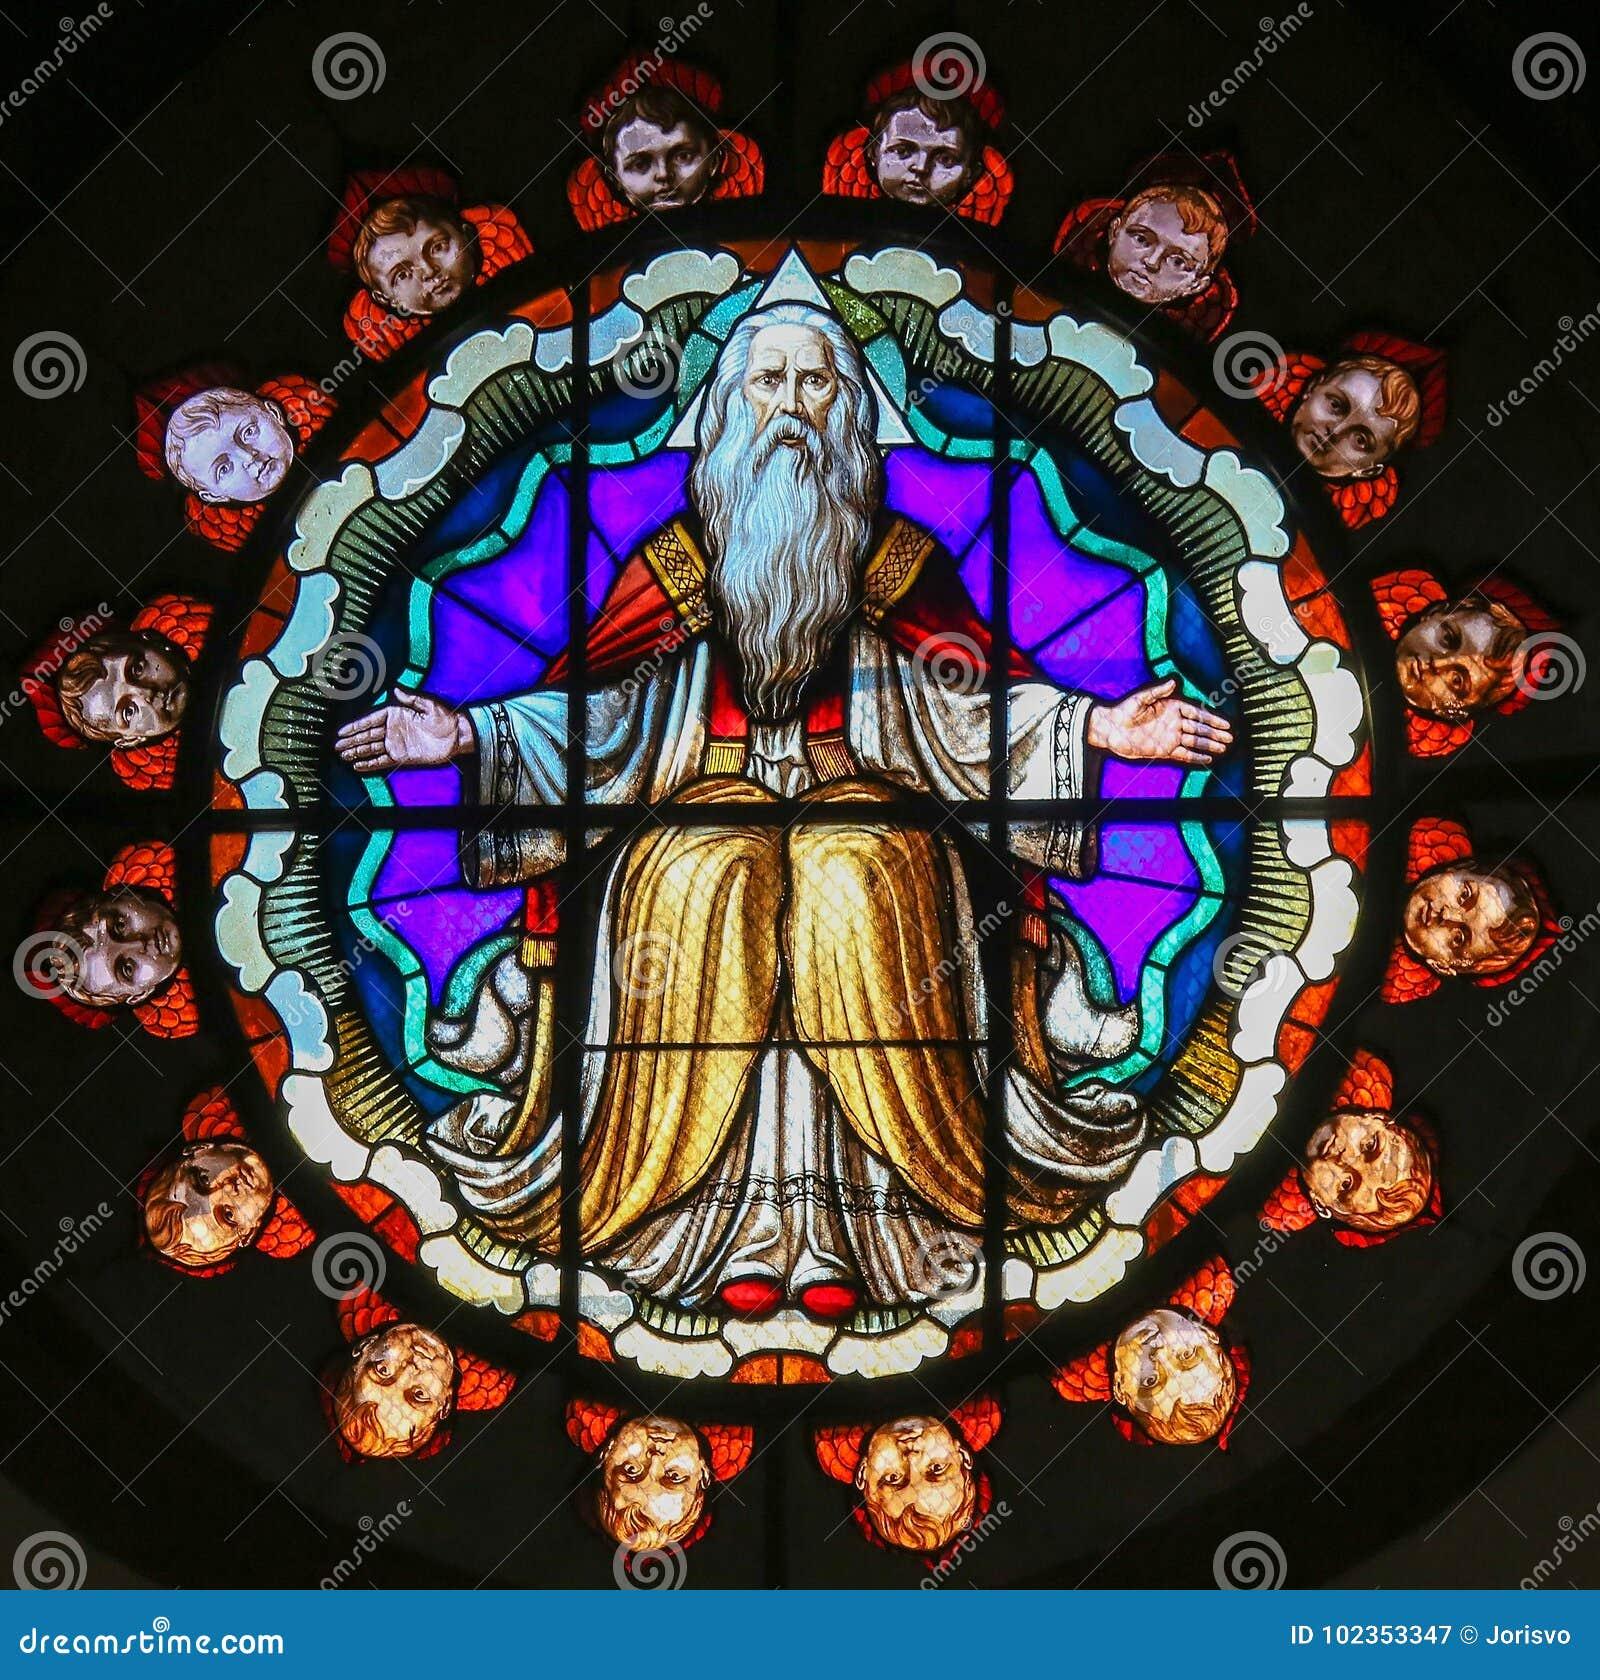 Stained Glass of God - Basilica of San Petronio, Bologna